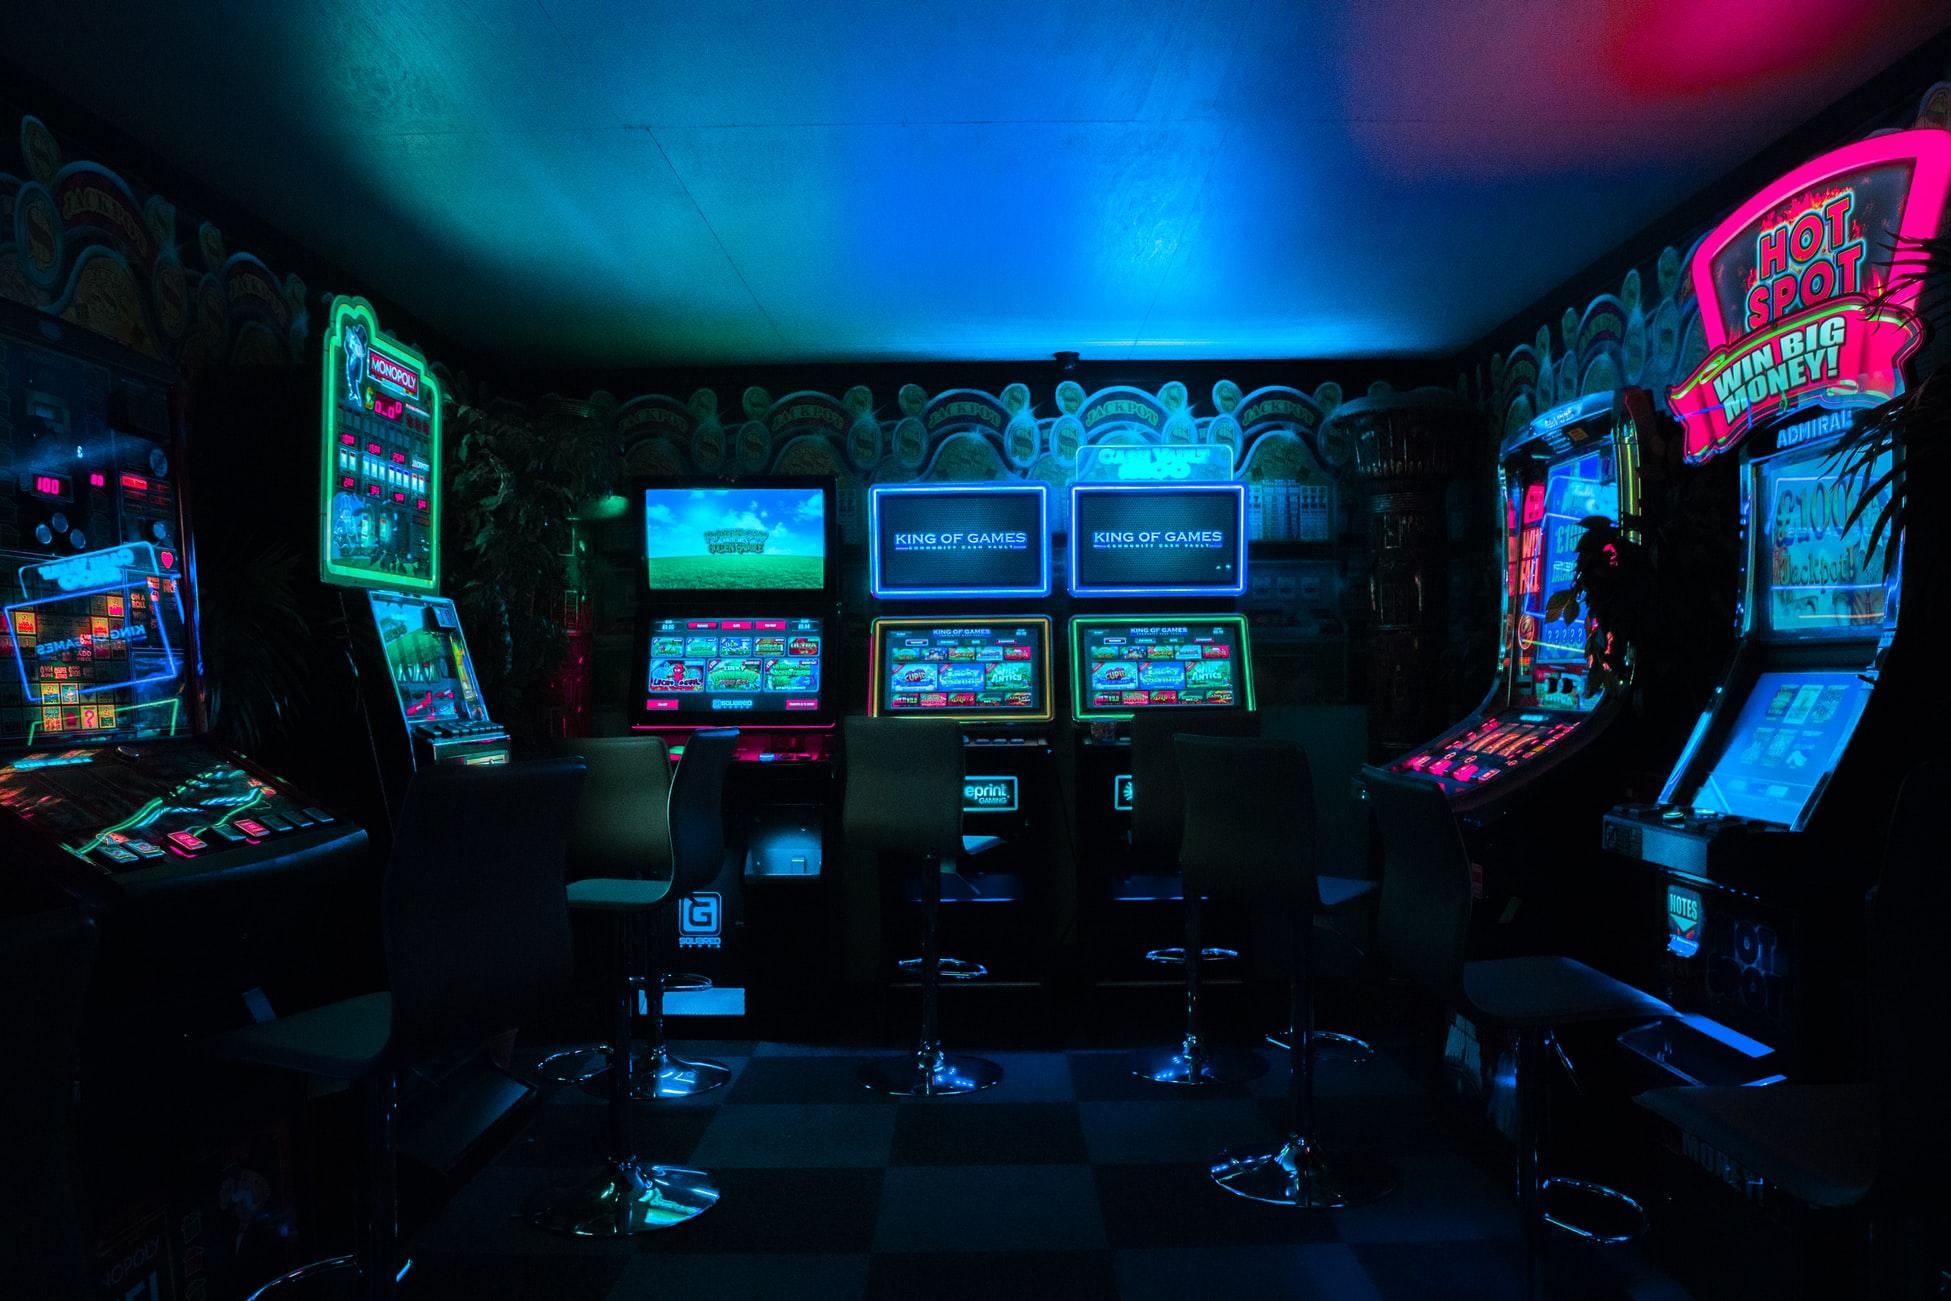 a hall of videogames. An arcade